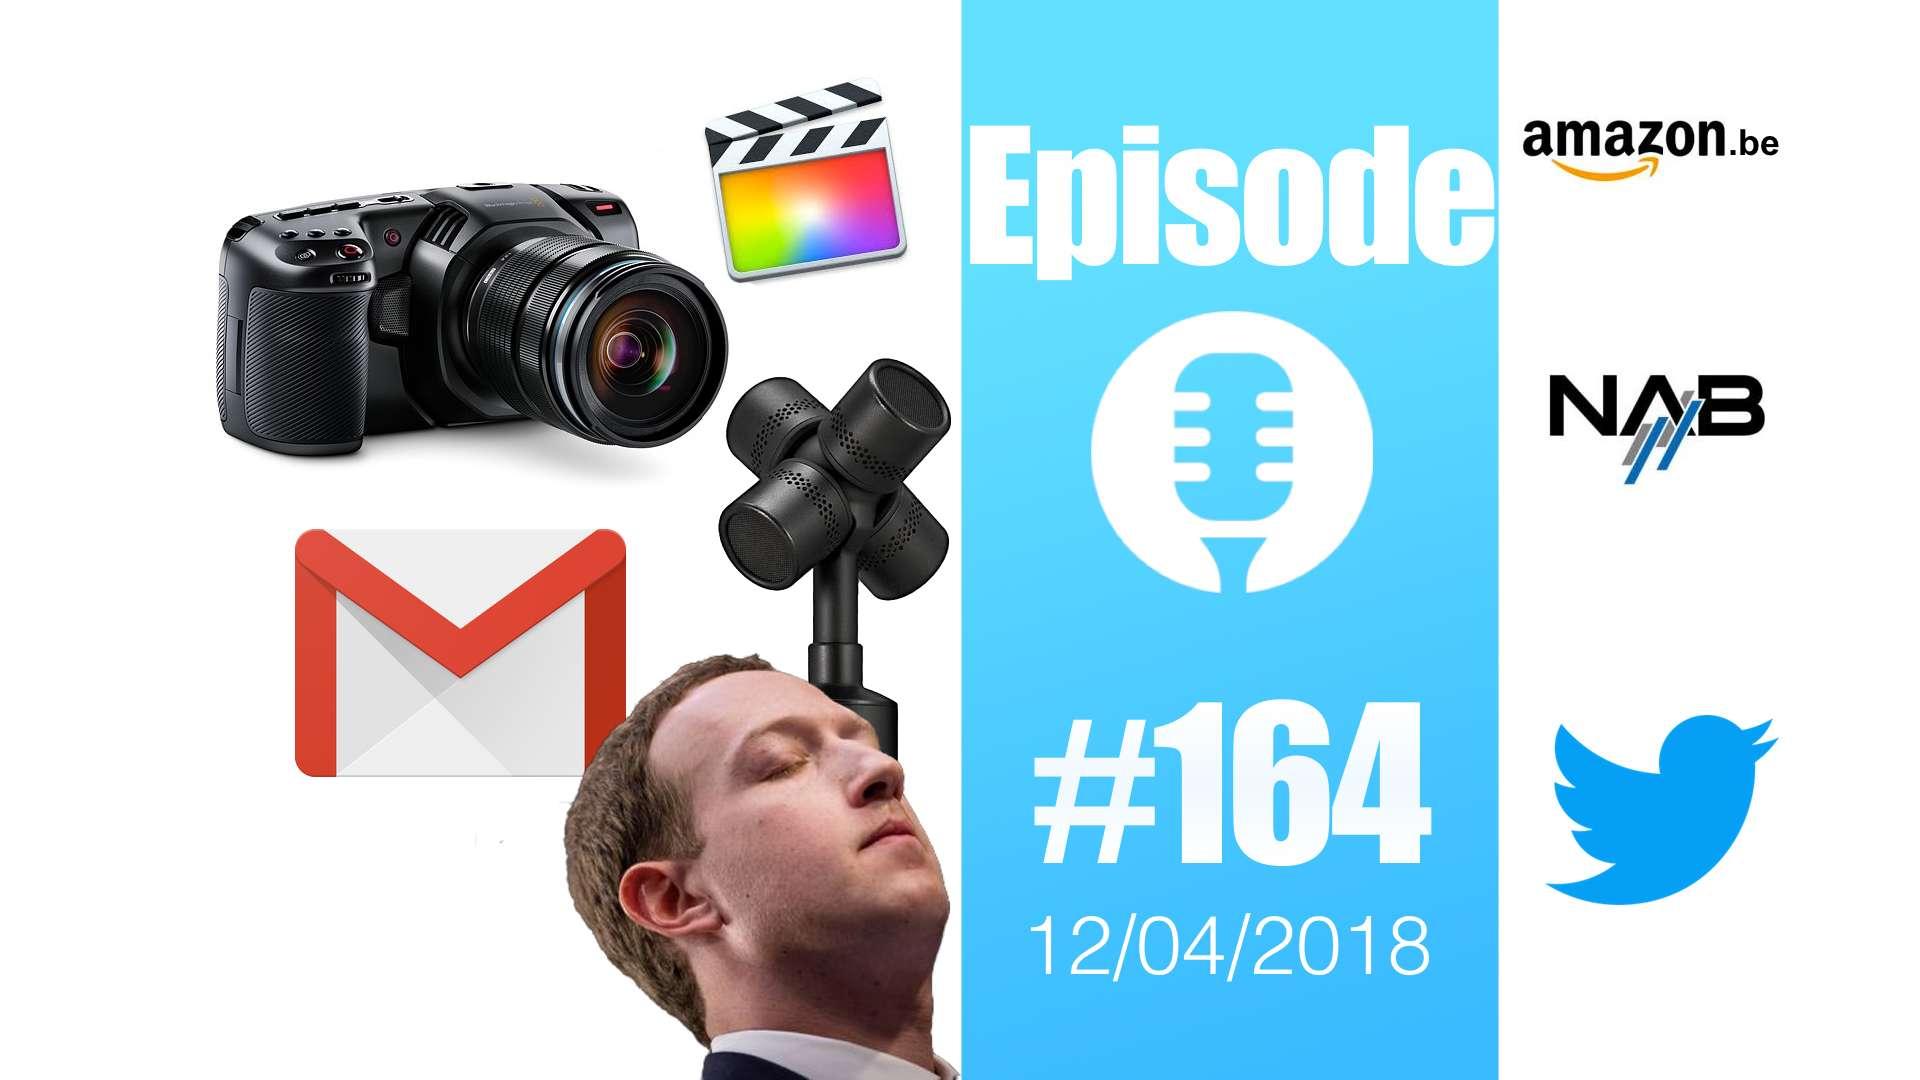 #164: NAB 2018, Pocket Cinema Camera 4K, Cubetto, Rode Soundfield NT-SF1, Mark Zuckerberg, GMail, Twitter, Final Cut Pro,…